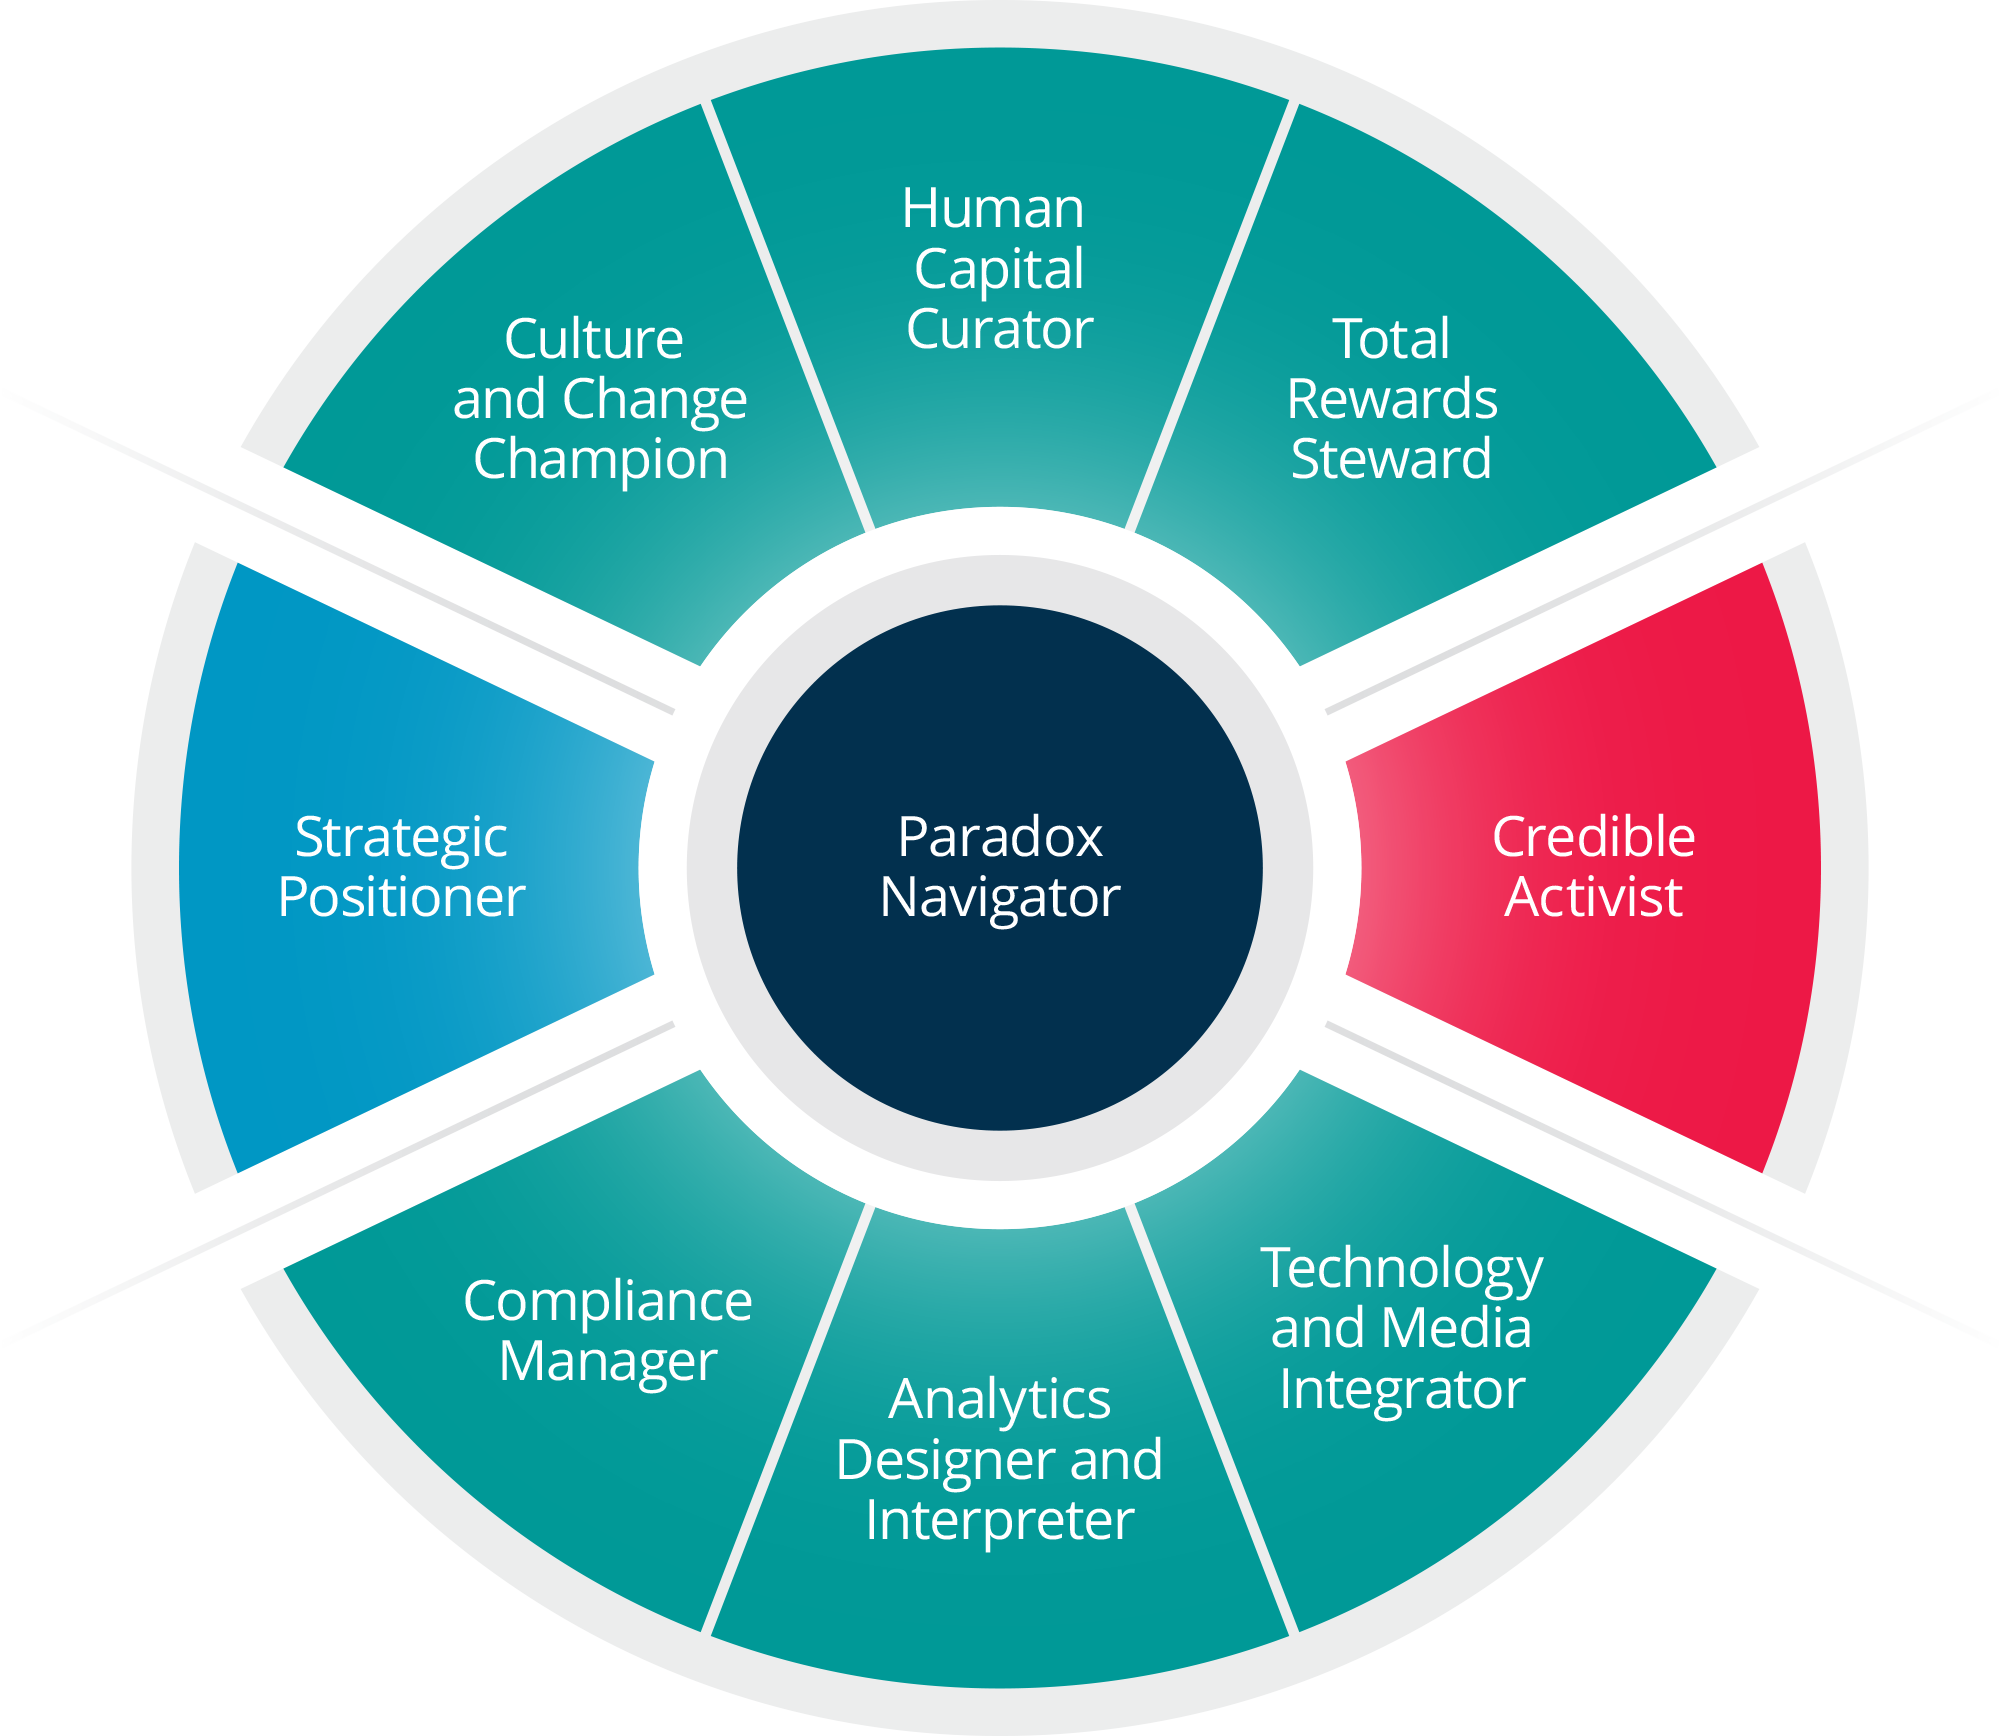 HR Competency Model 2016